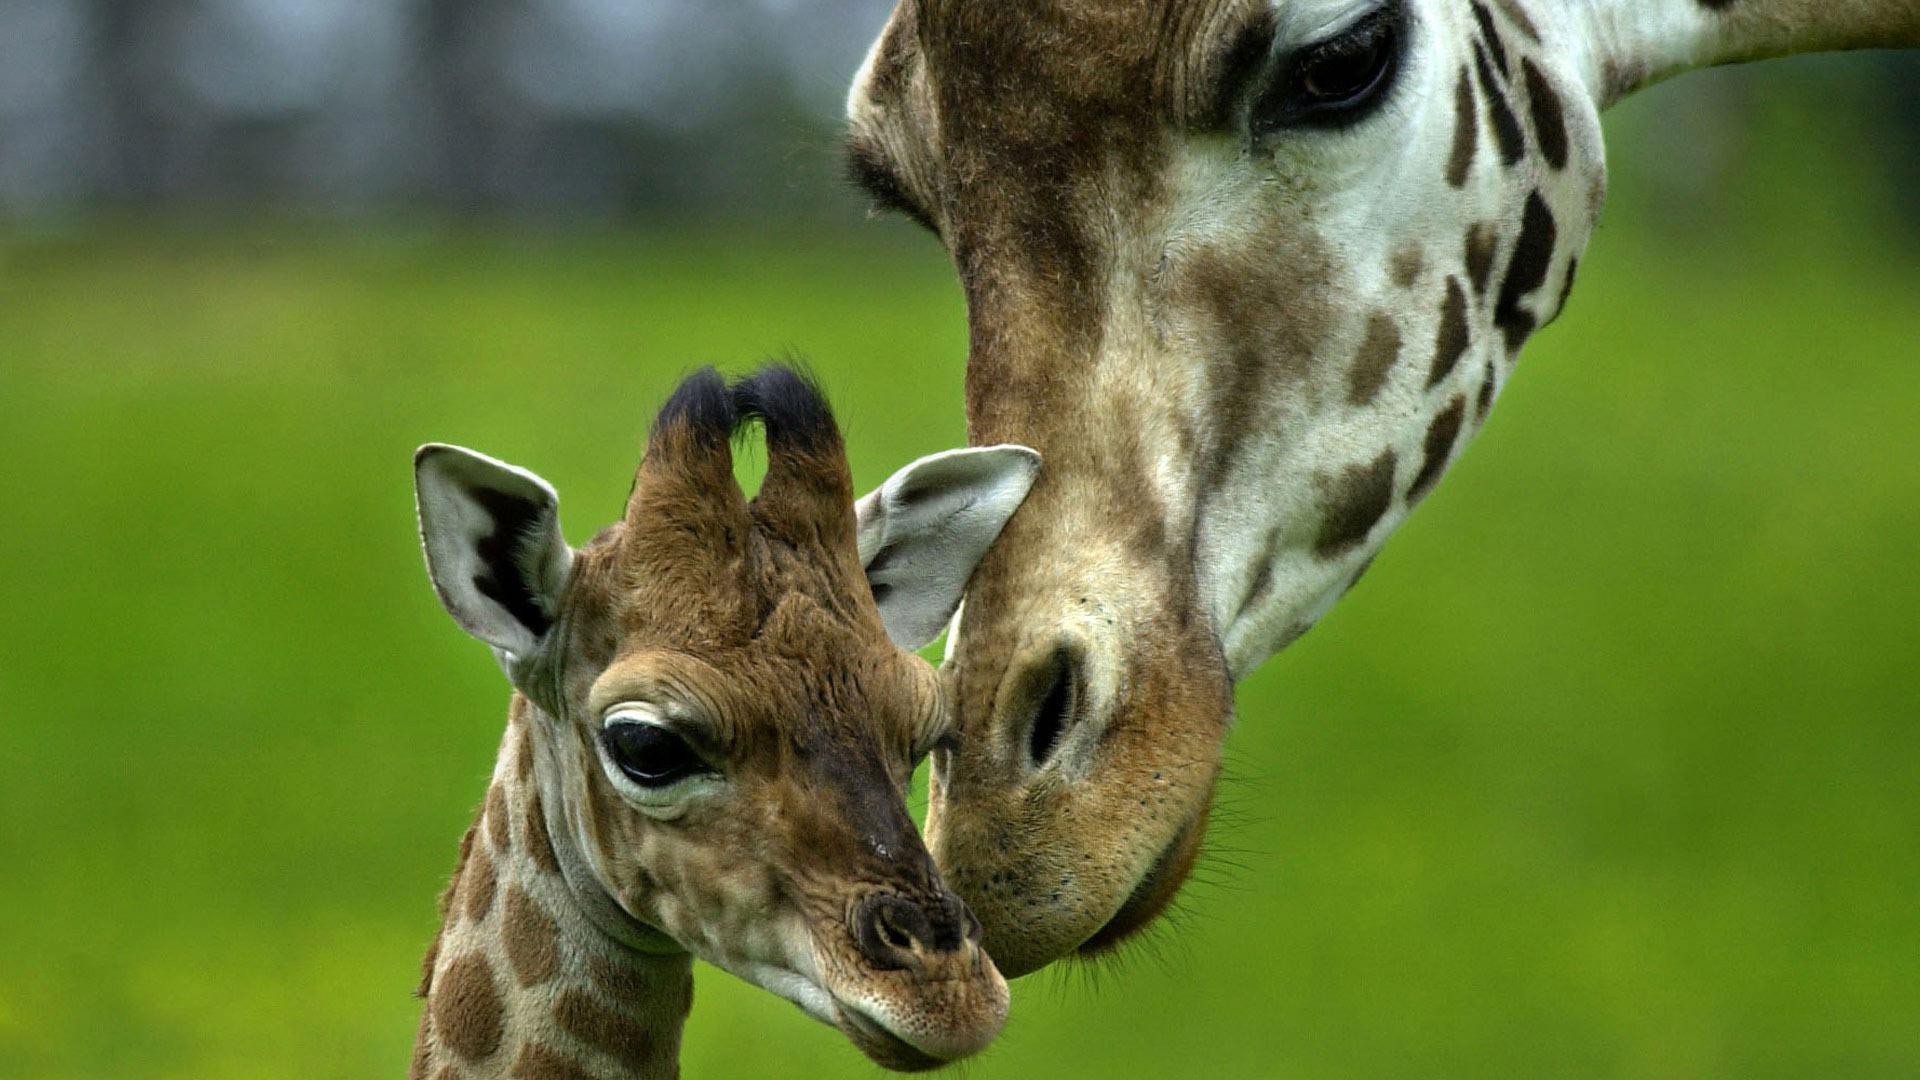 giraffe image free